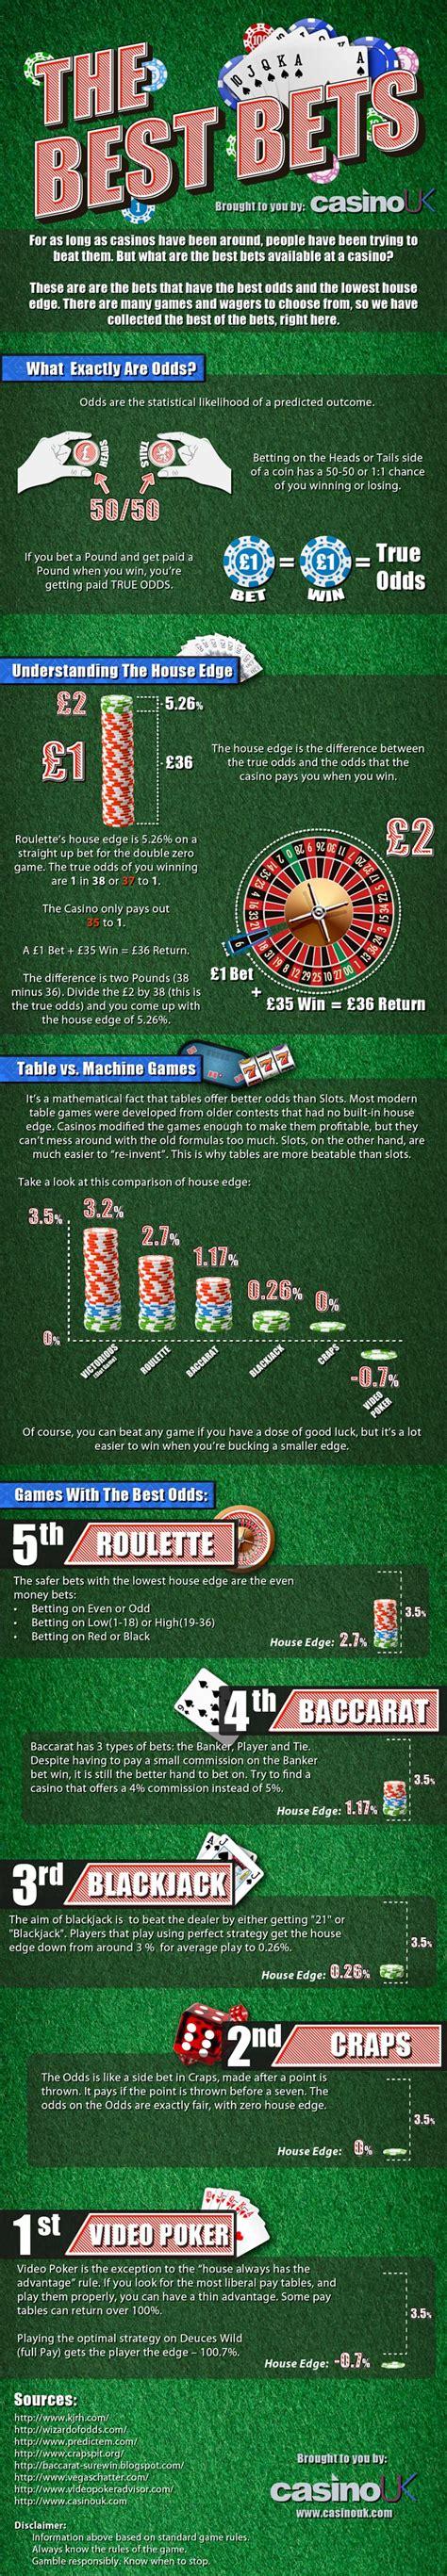 Winning Money At Casino - best chance of winning money at casino backuperduck